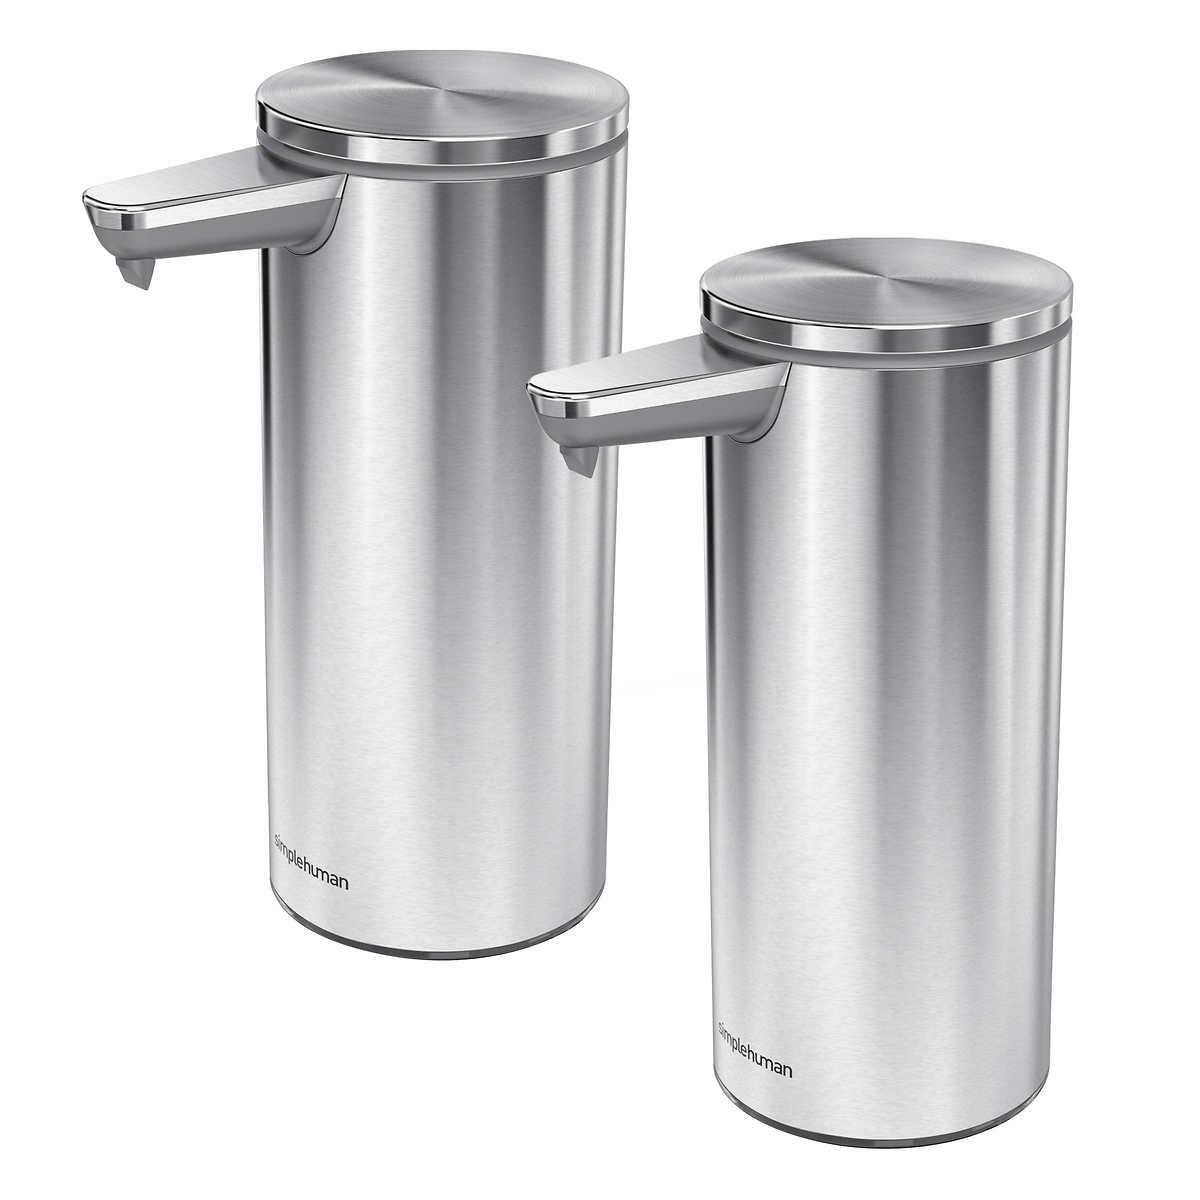 Simplehuman Rechargeable Sensor Soap Dispenser 2 Pack